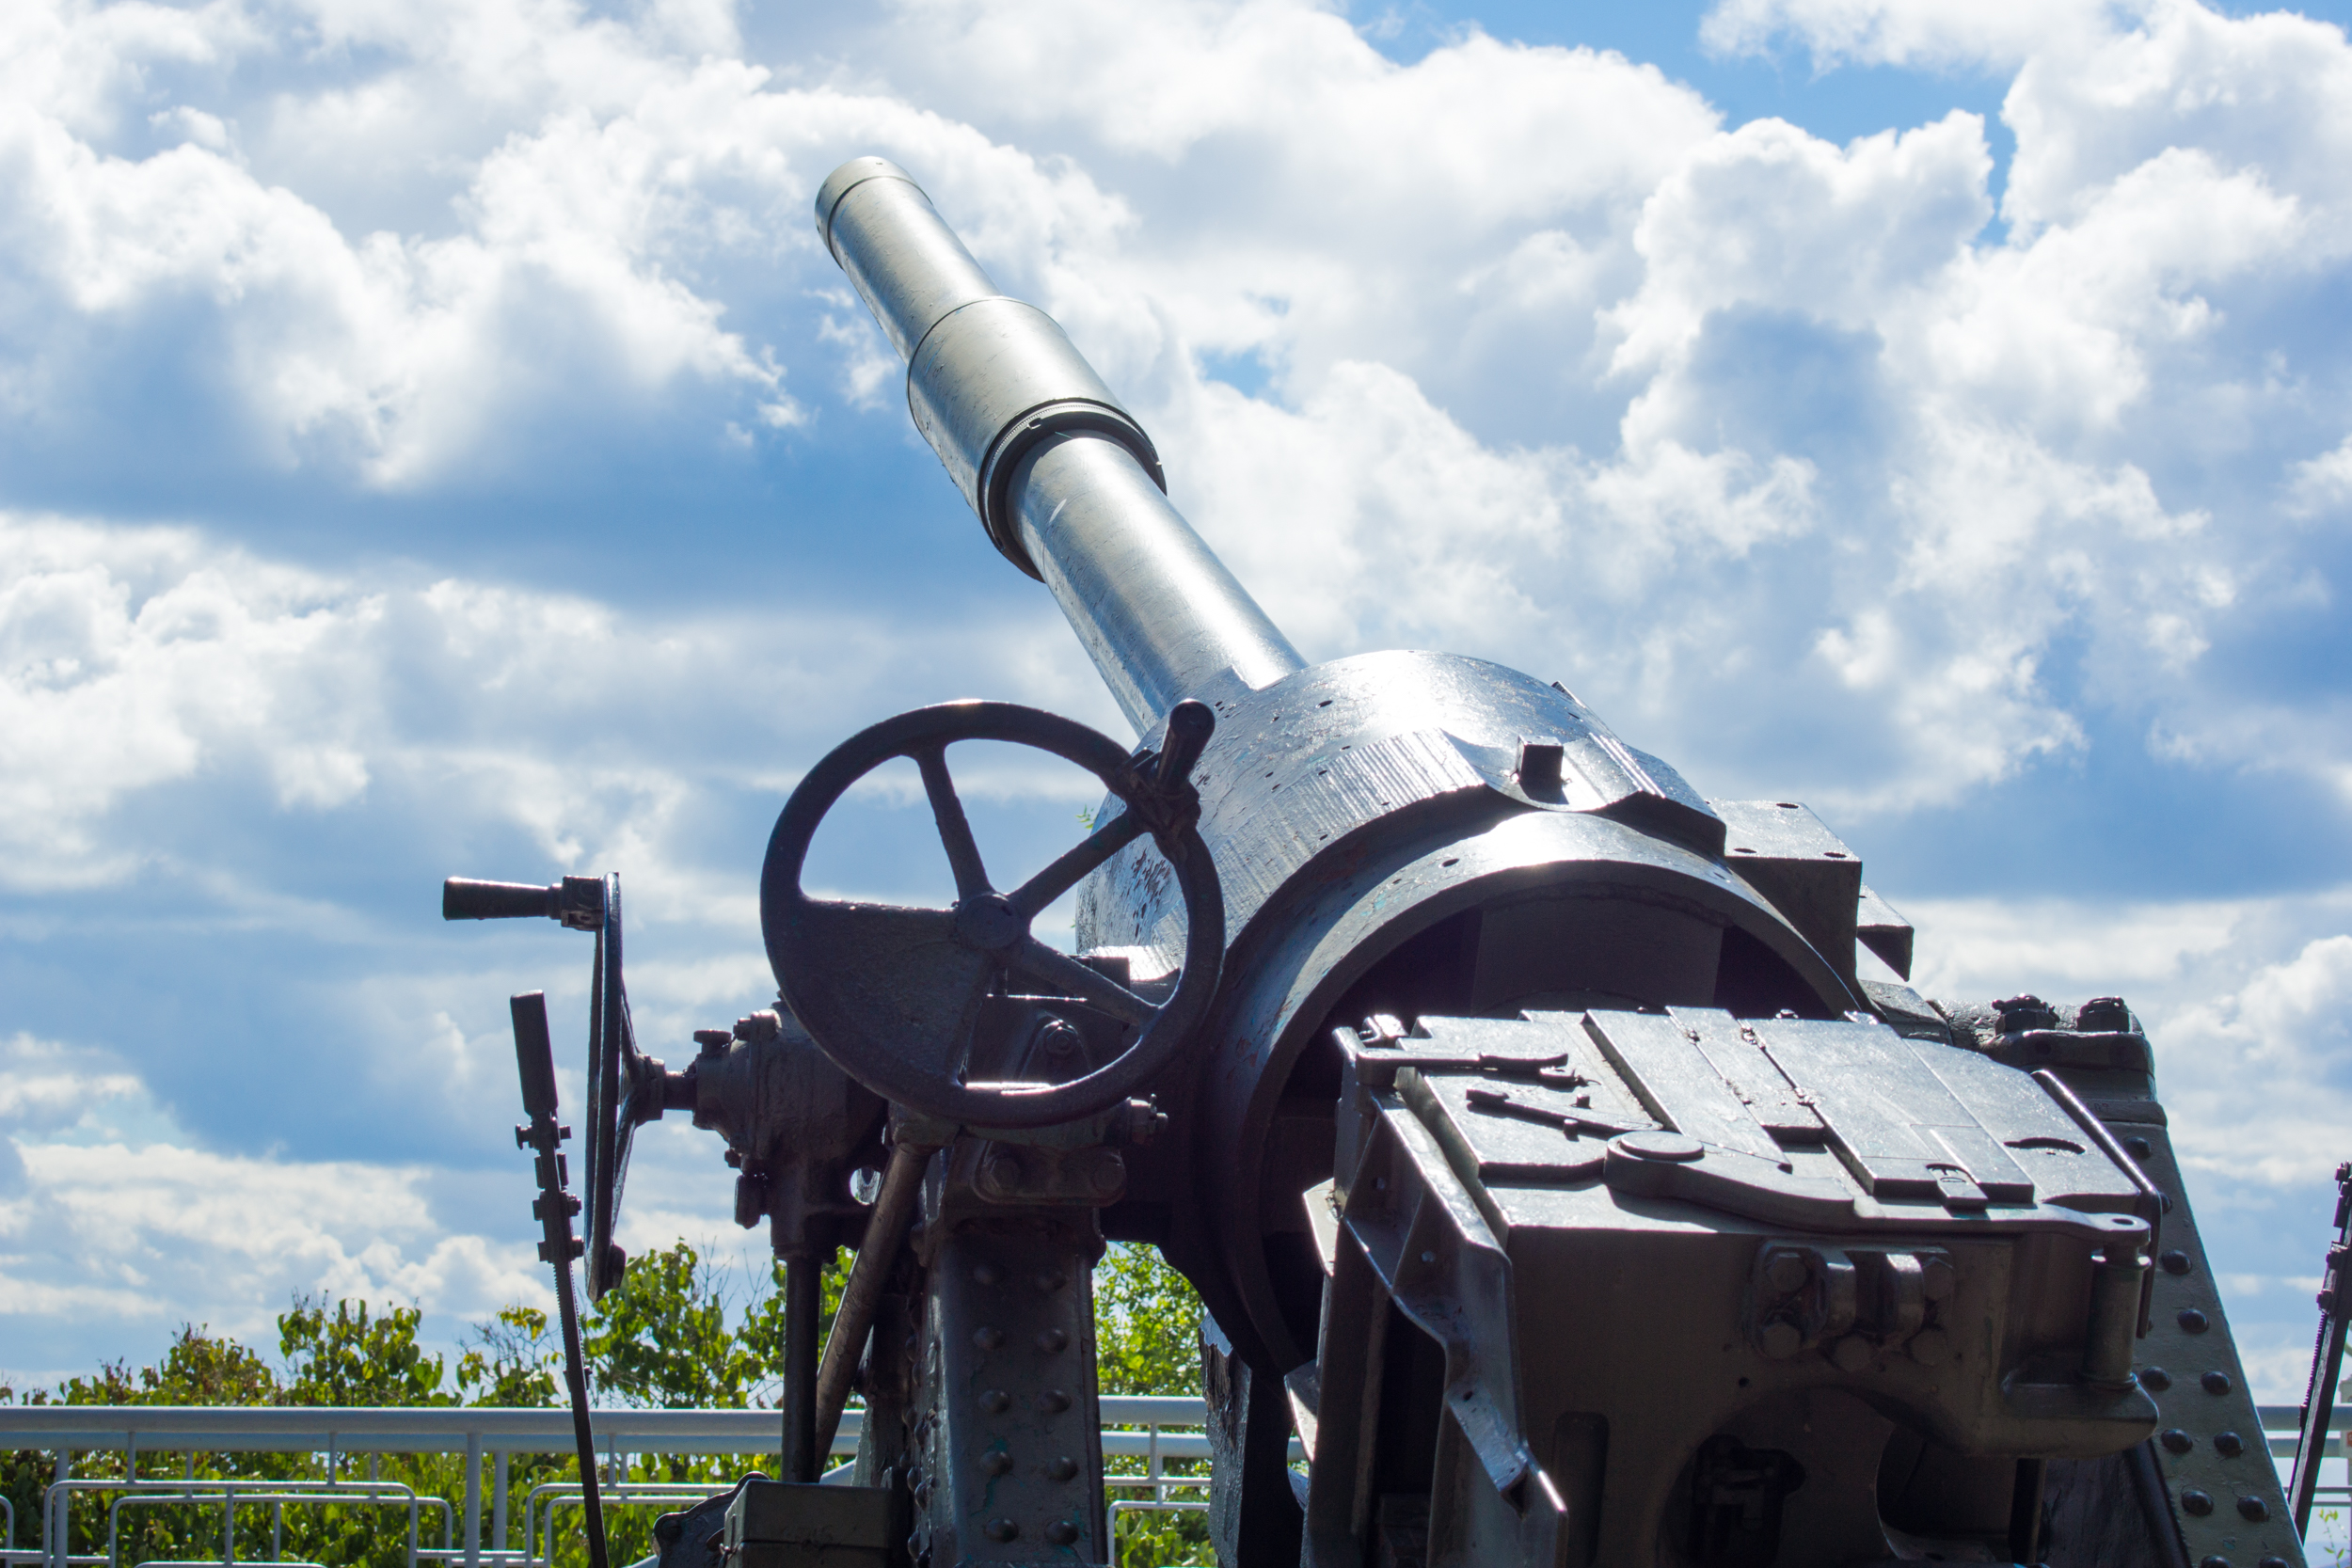 Pistola de la segunda guerra mundial